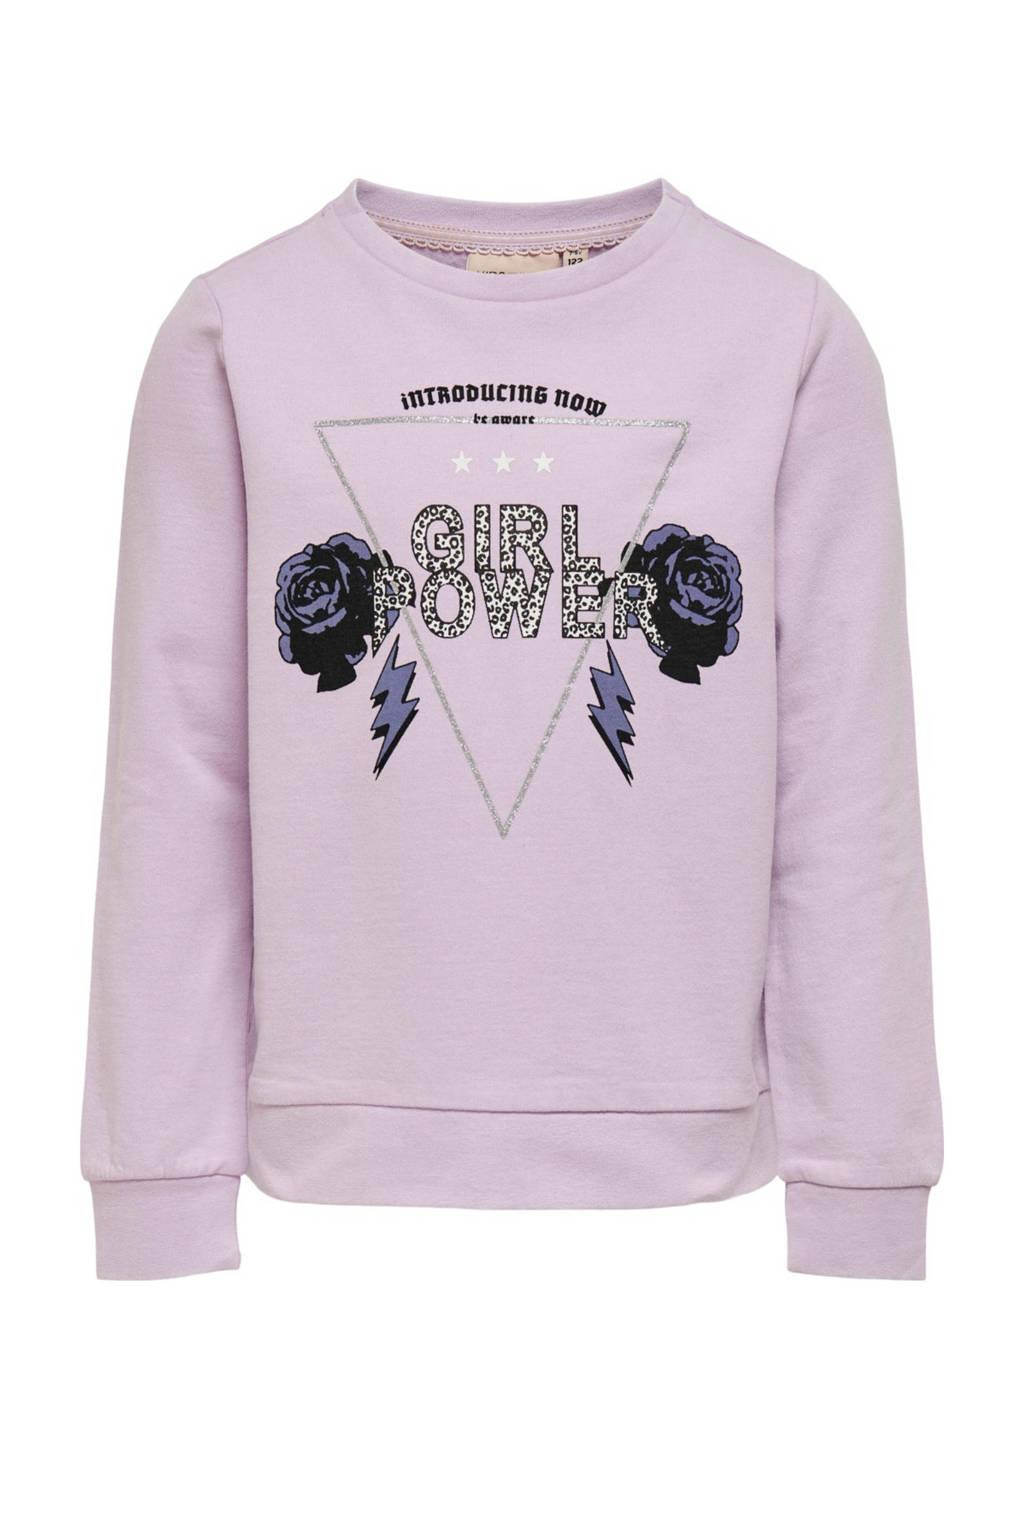 KIDS ONLY sweater Lucinda met printopdruk en glitters lila/zwart/zilver, Lila/zwart/zilver